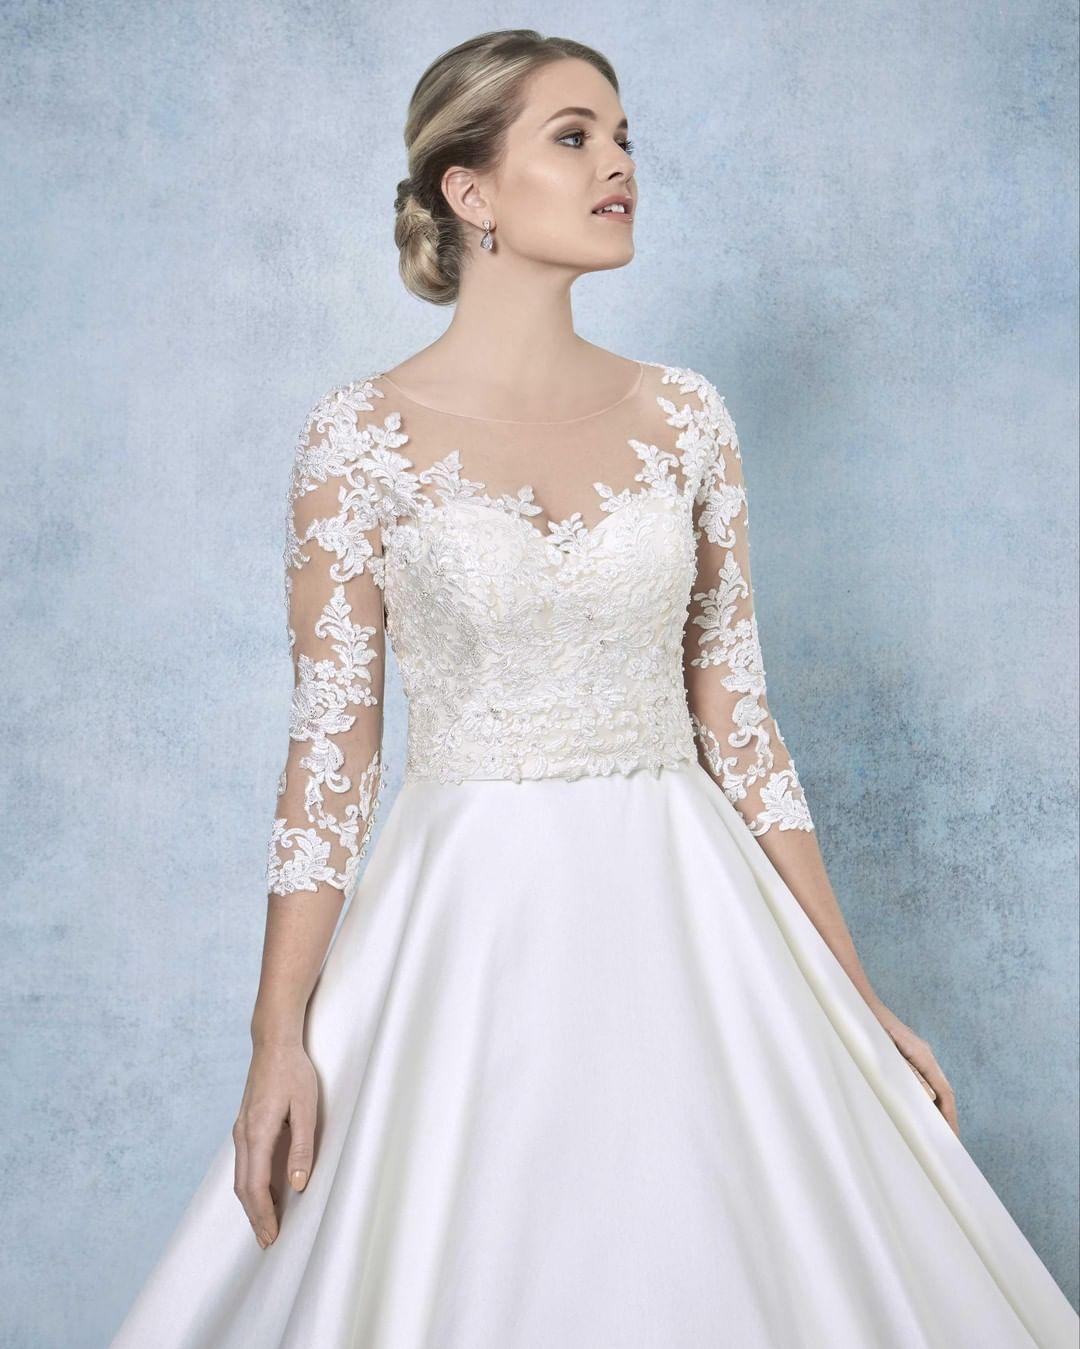 Dress wed2b whitedress weddingphotography wedding